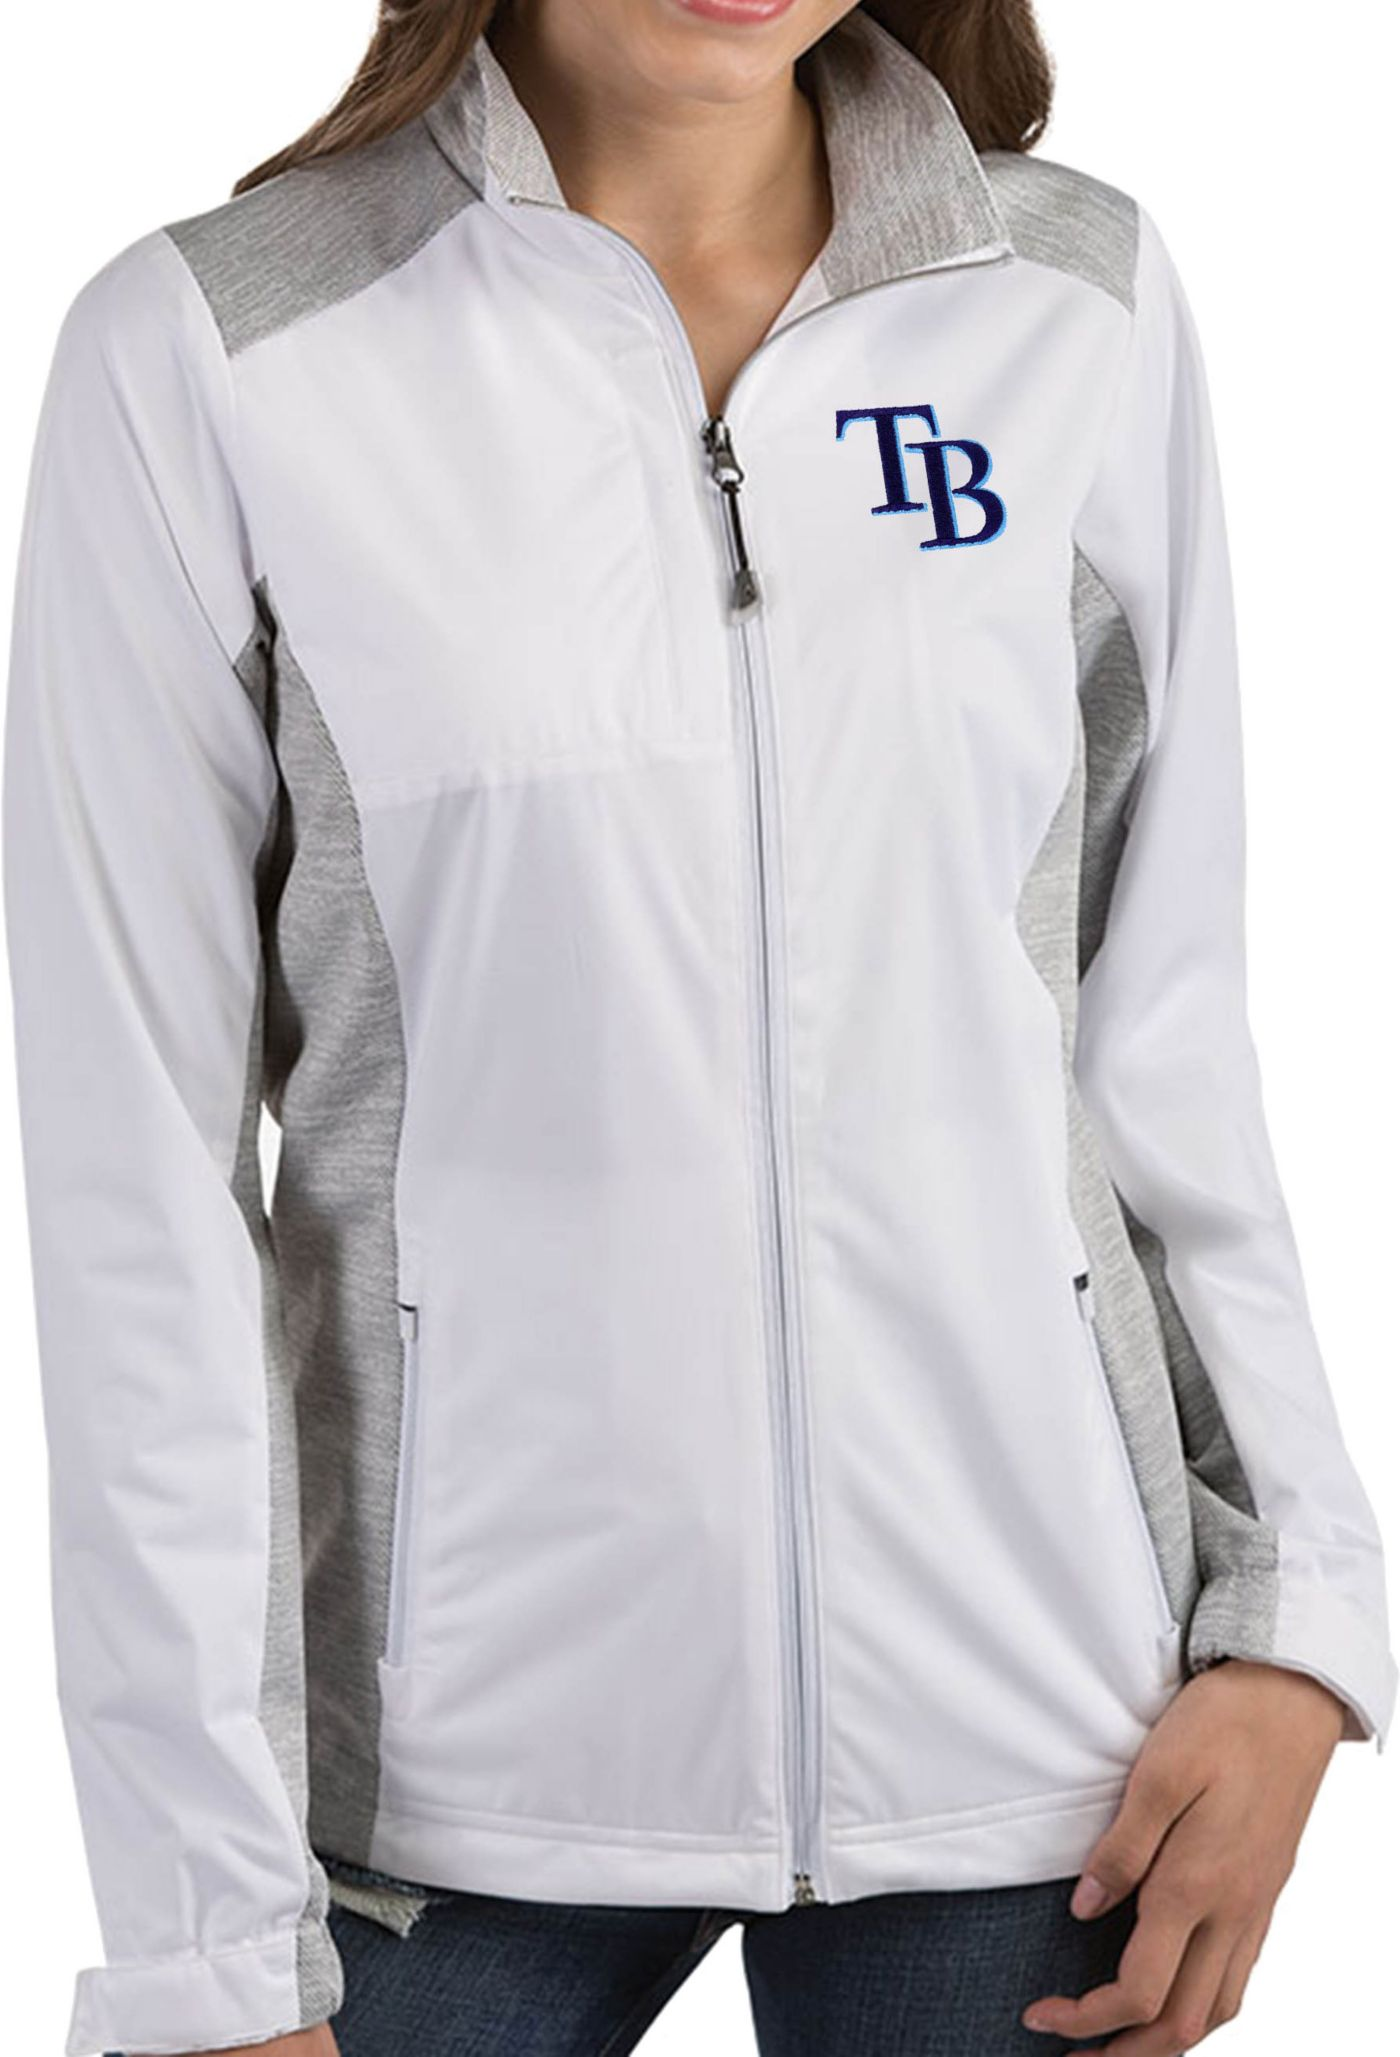 Antigua Women's Tampa Bay Rays Revolve White Full-Zip Jacket